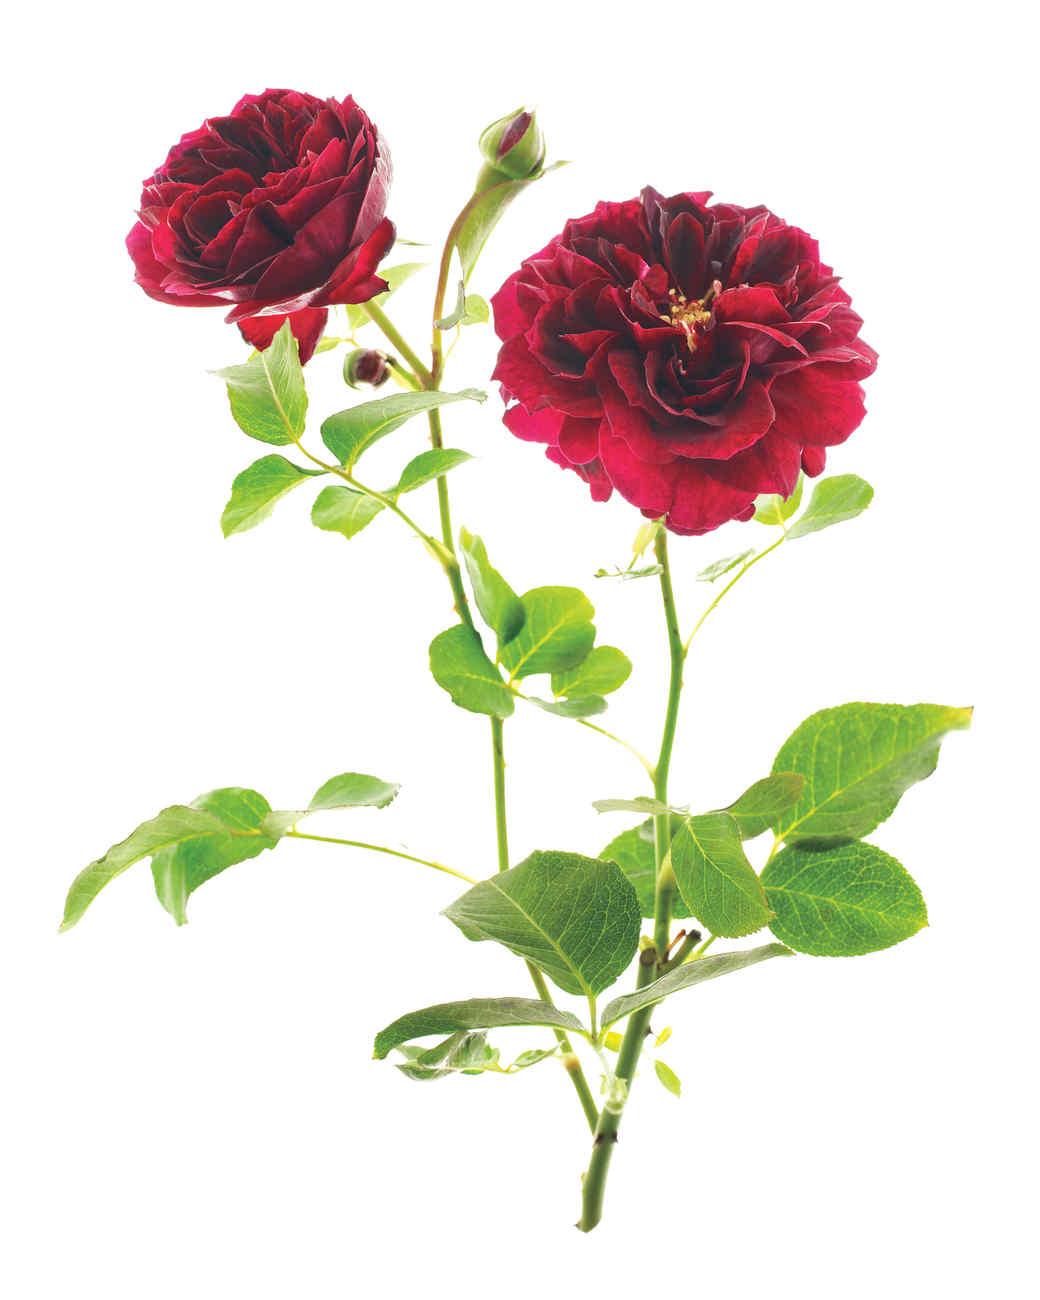 tradescant-rose-ms108508.jpg